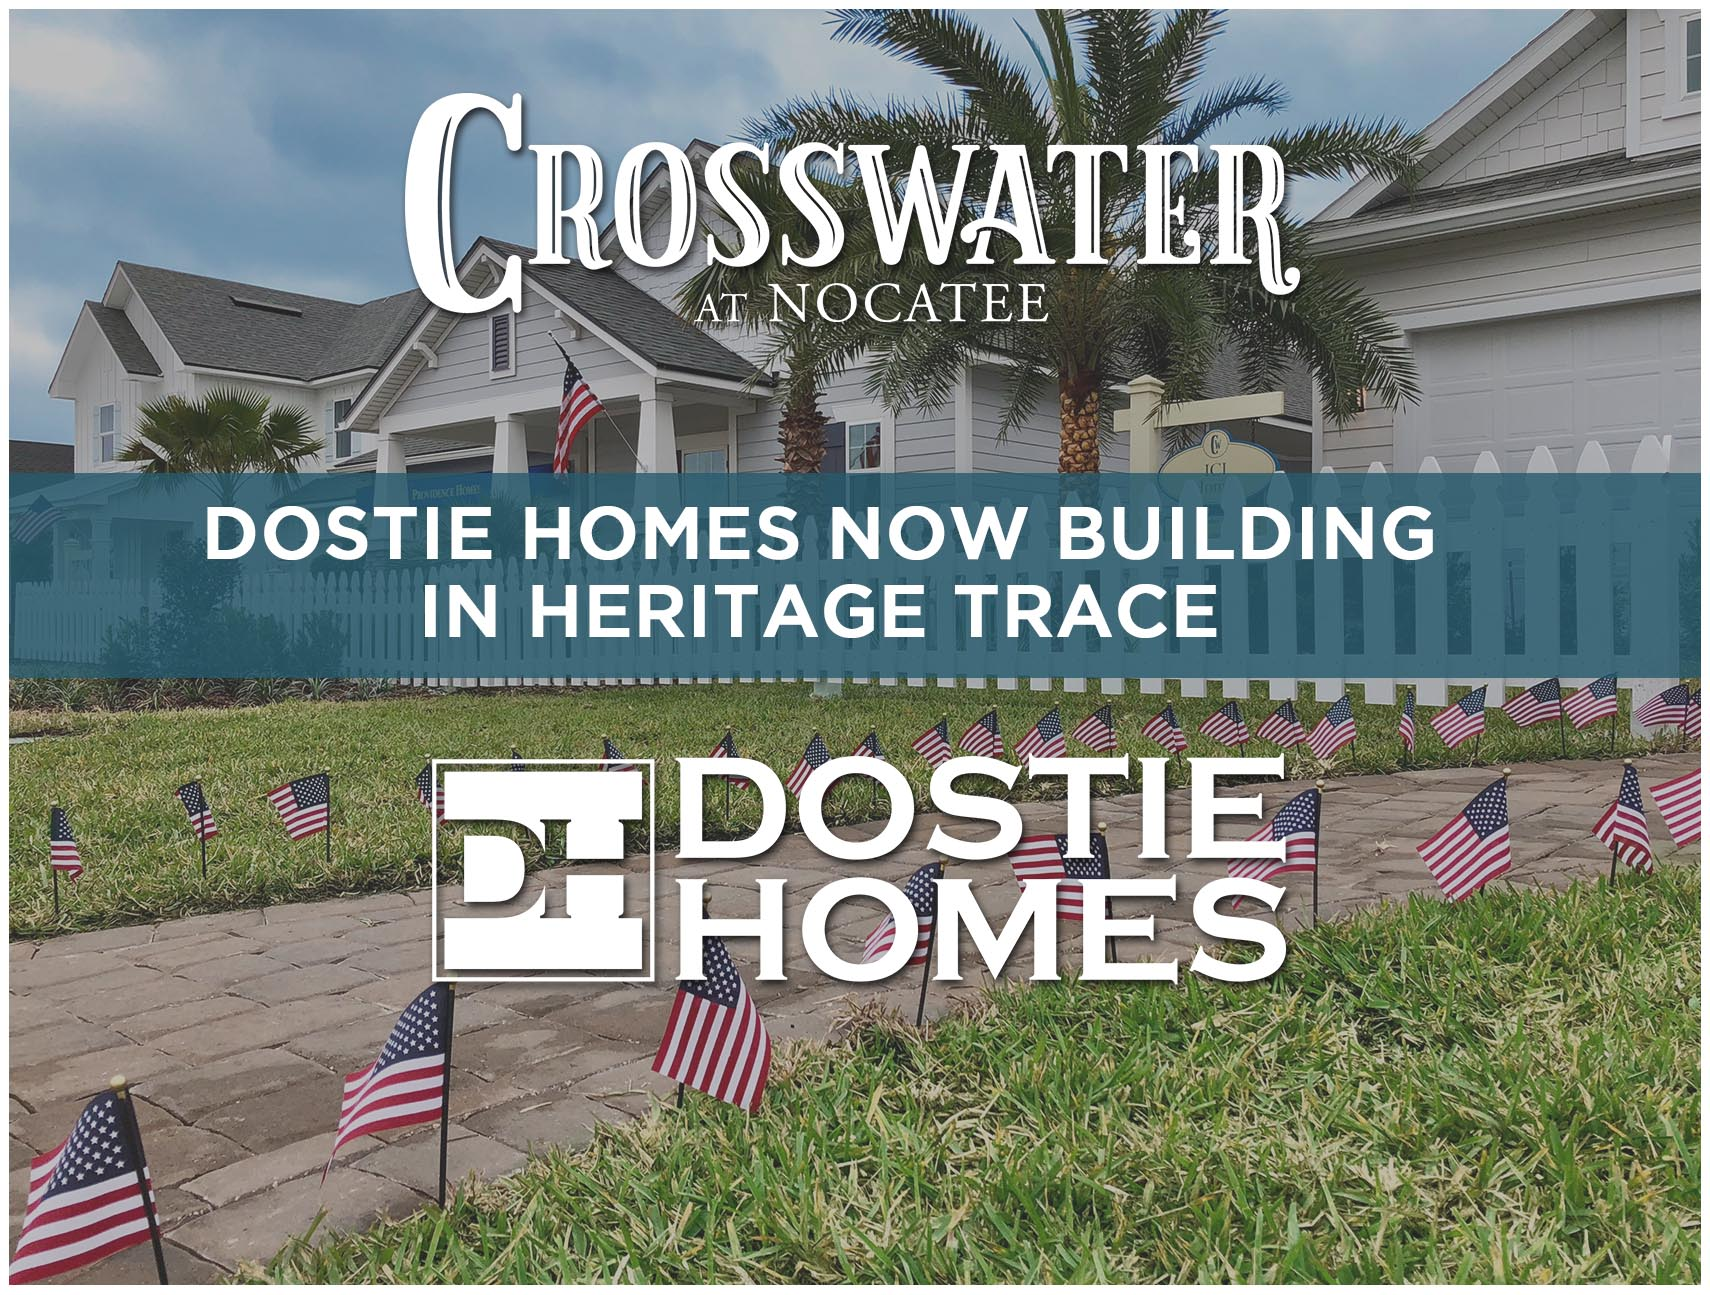 Dostie Homes Building in Heritage Trace in Crosswater